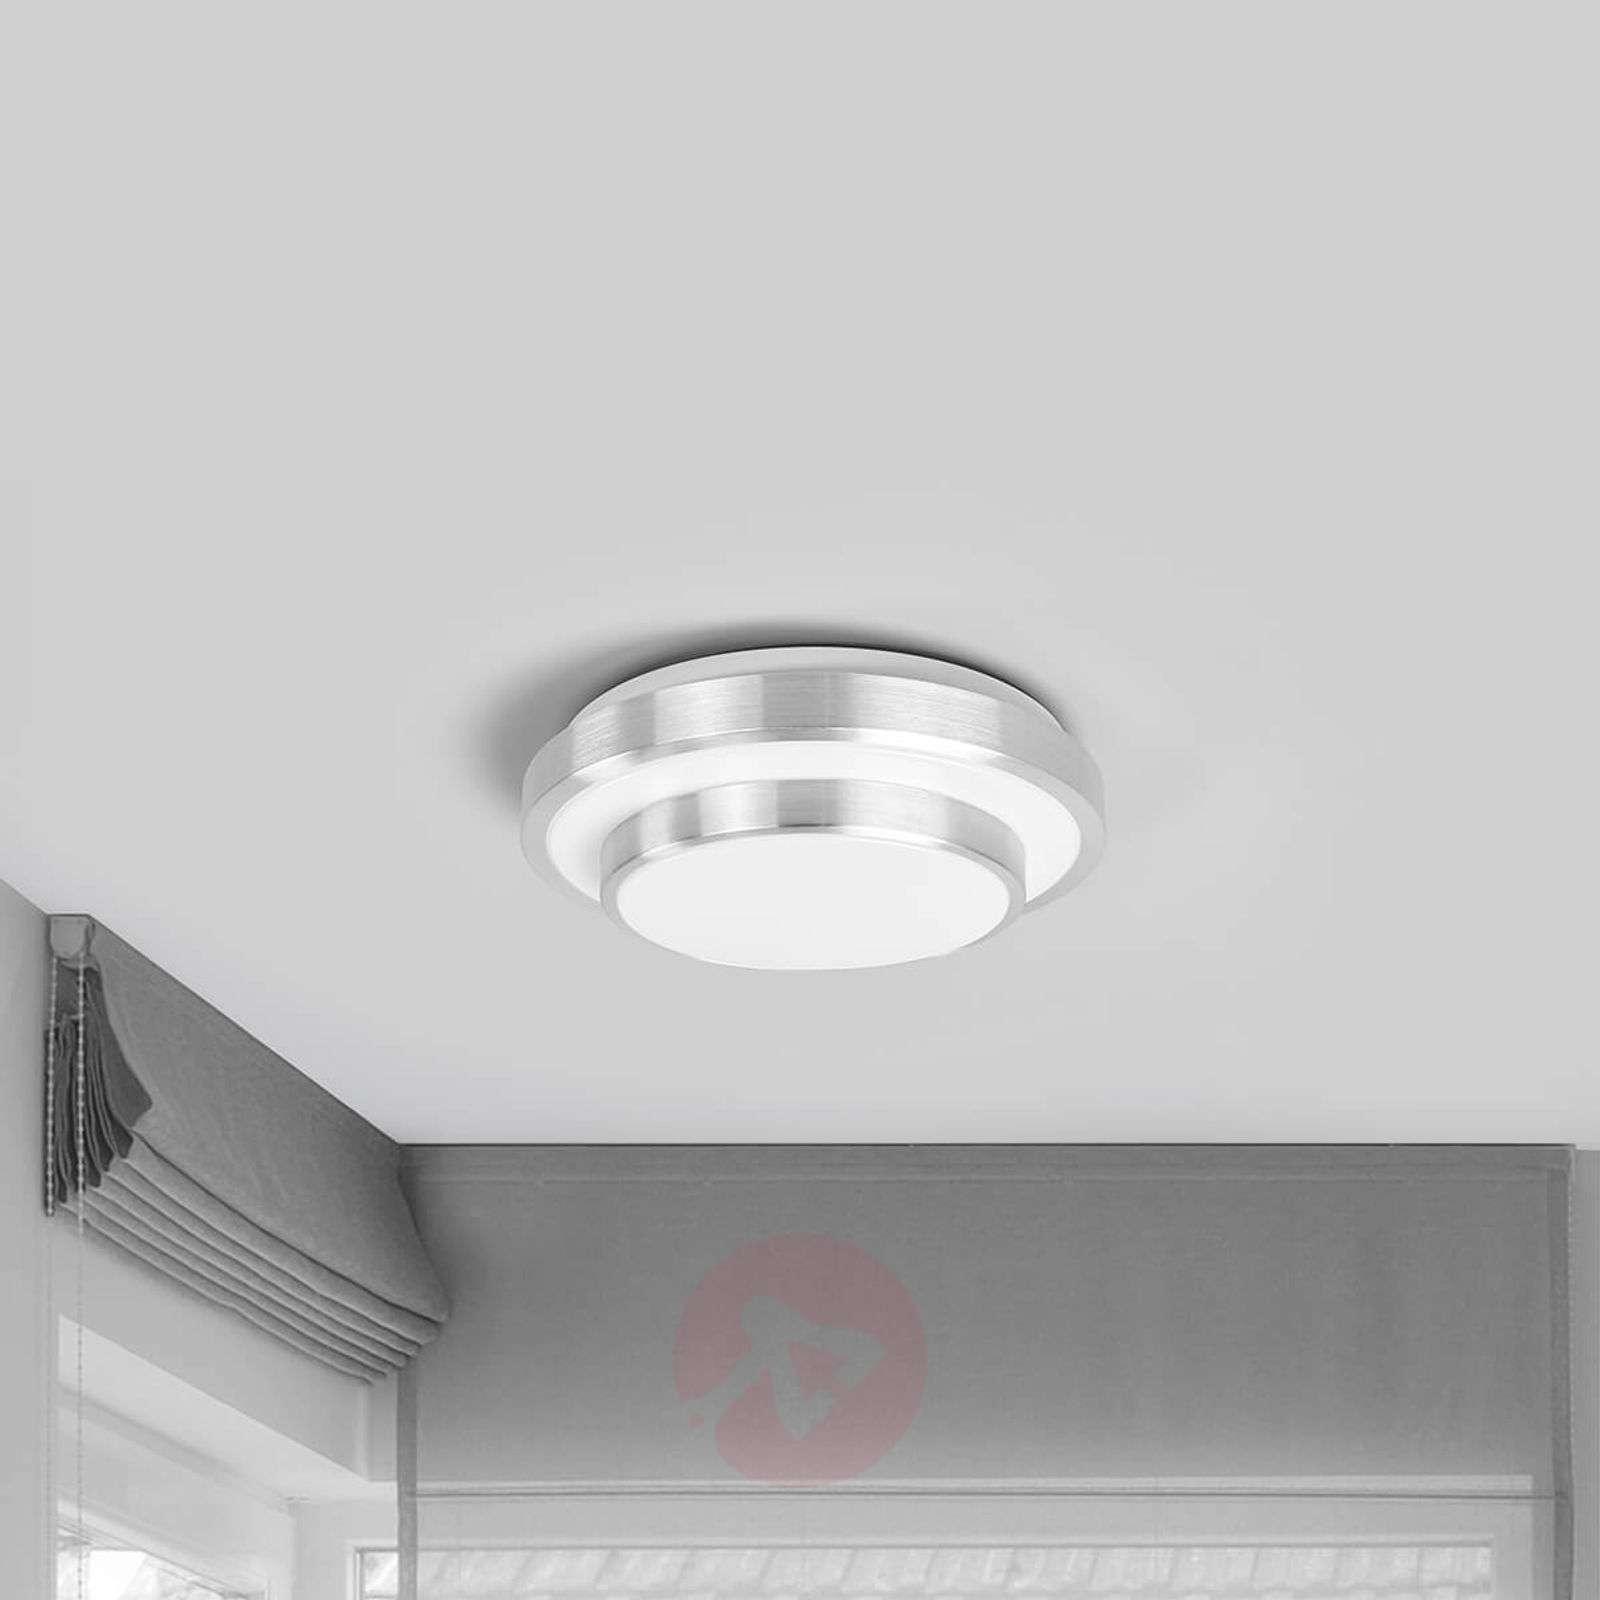 Huberta - round LED ceiling lamp, aluminium frame | Lights.ie